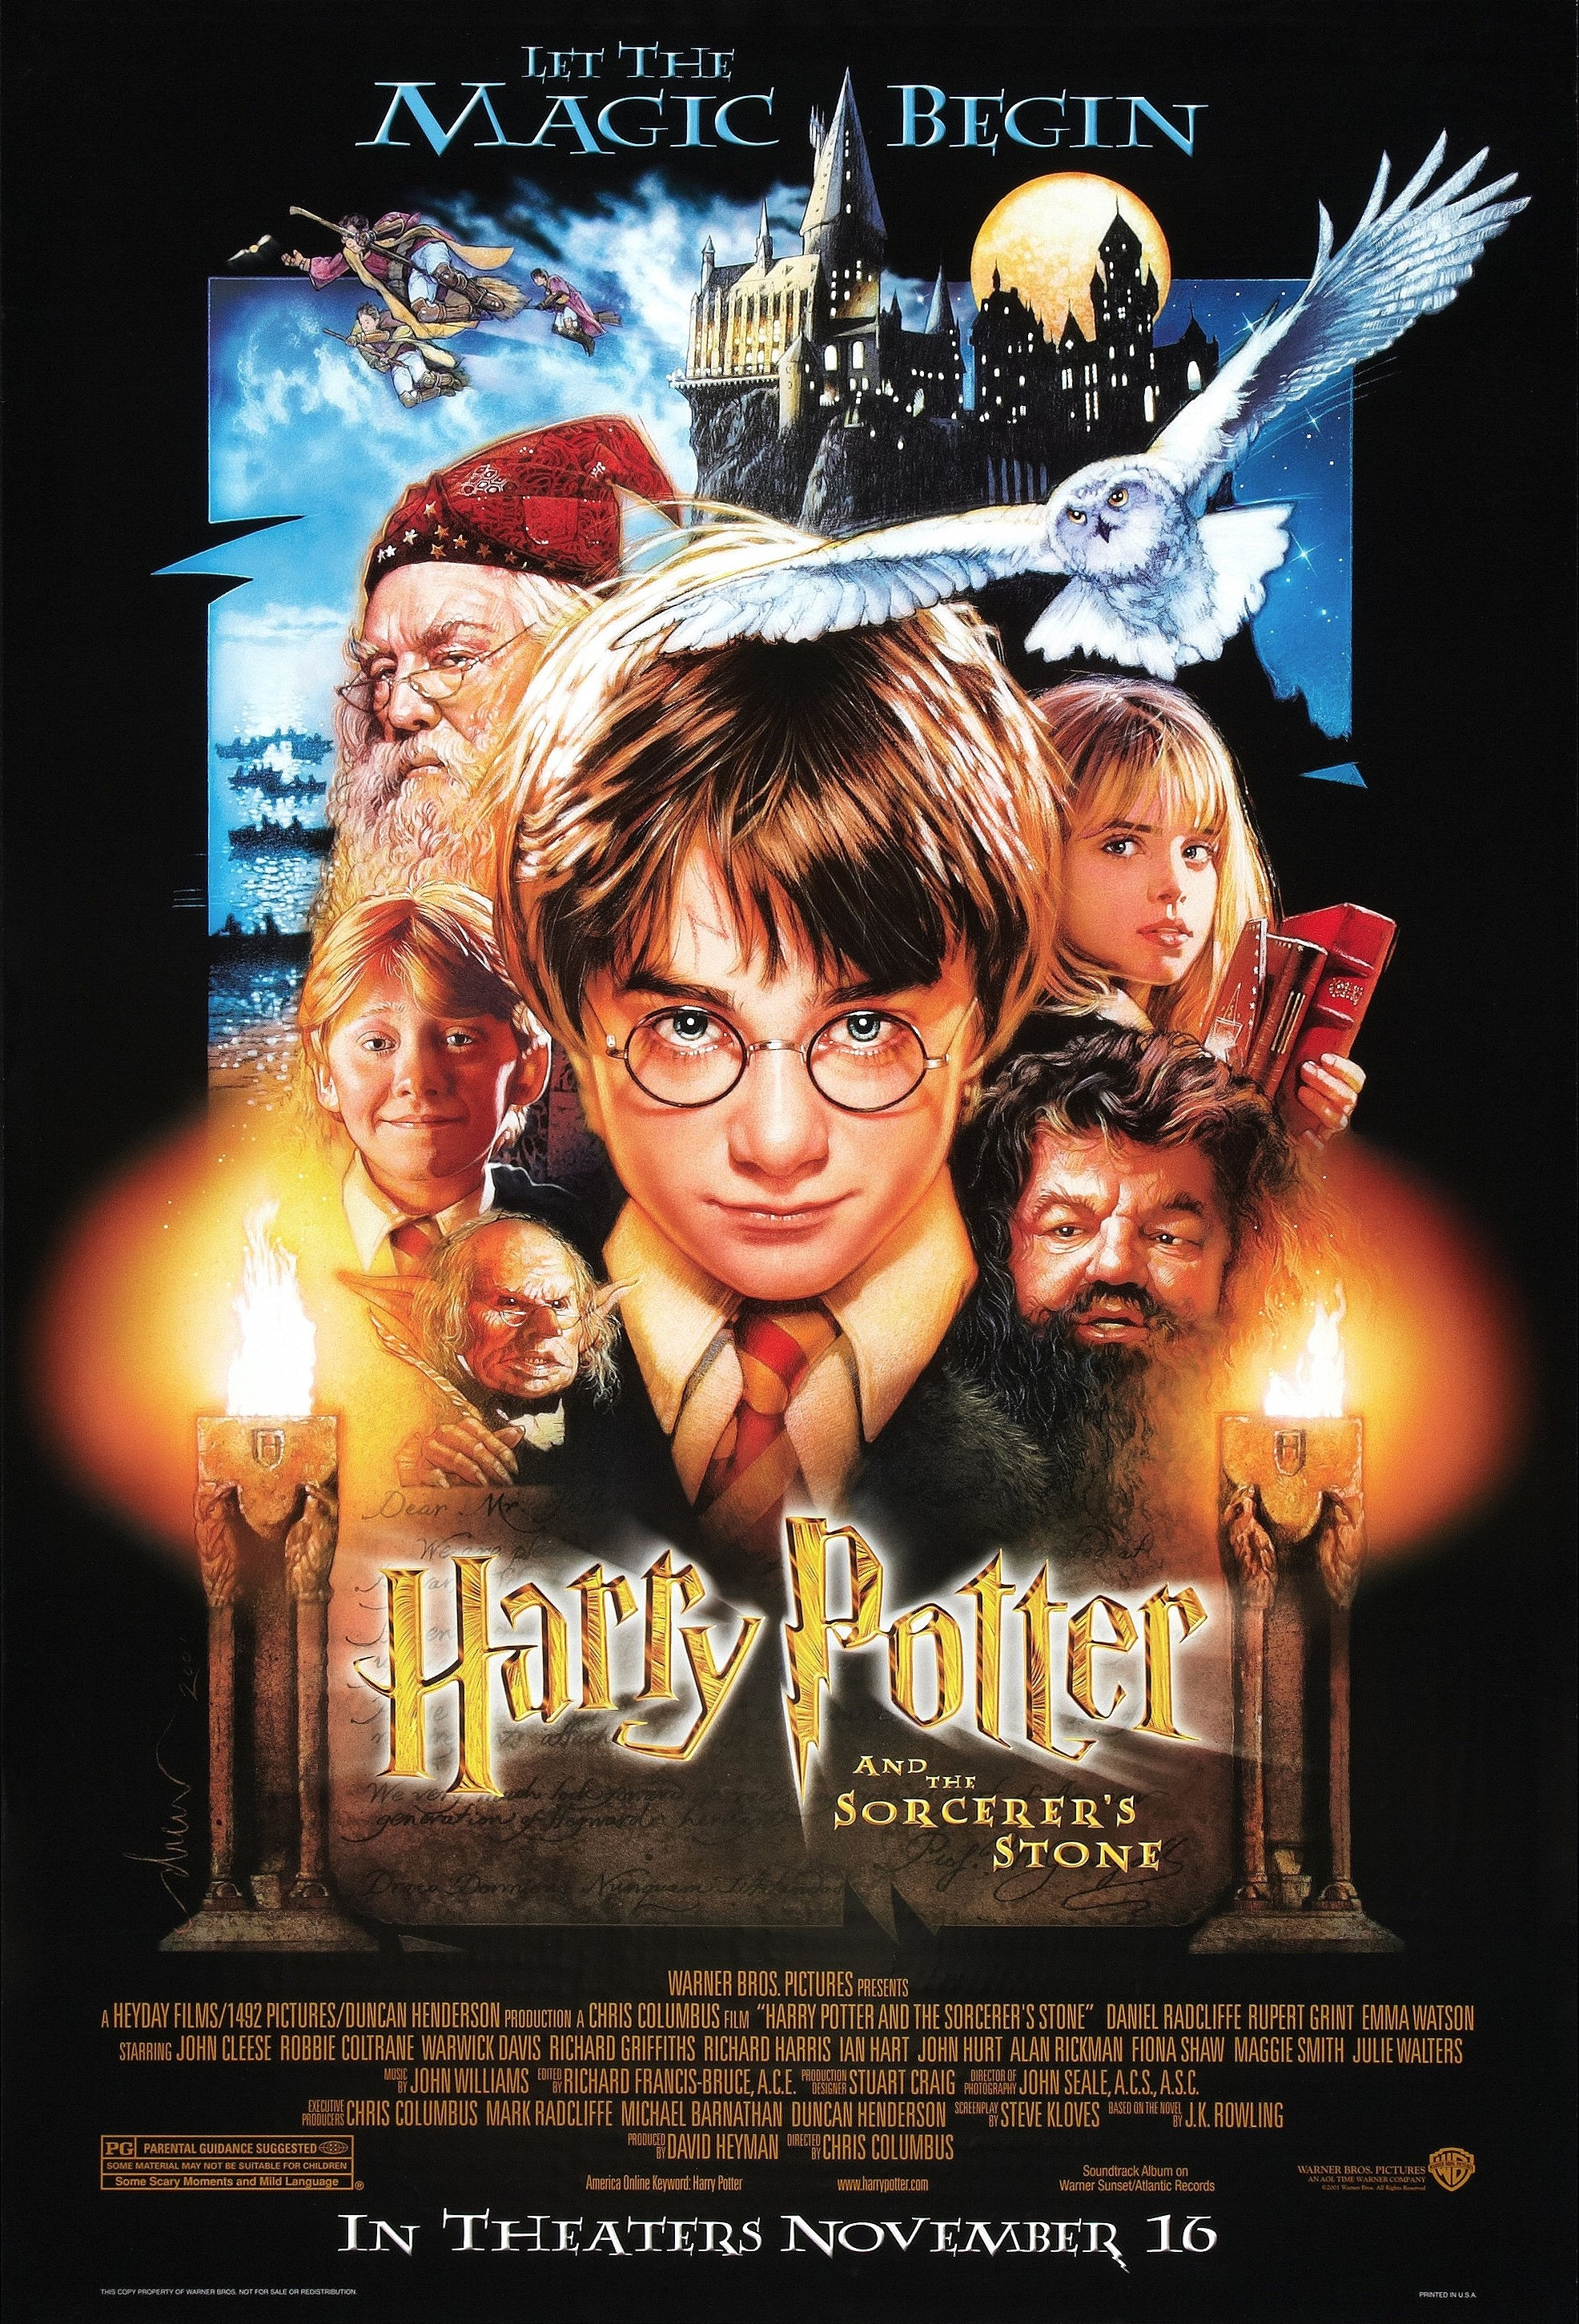 Robbie Coltrane, Warwick Davis, Richard Harris, Rupert Grint, Daniel Radcliffe, and Emma Watson in Harry Potter and the Sorcerer's Stone (2001)